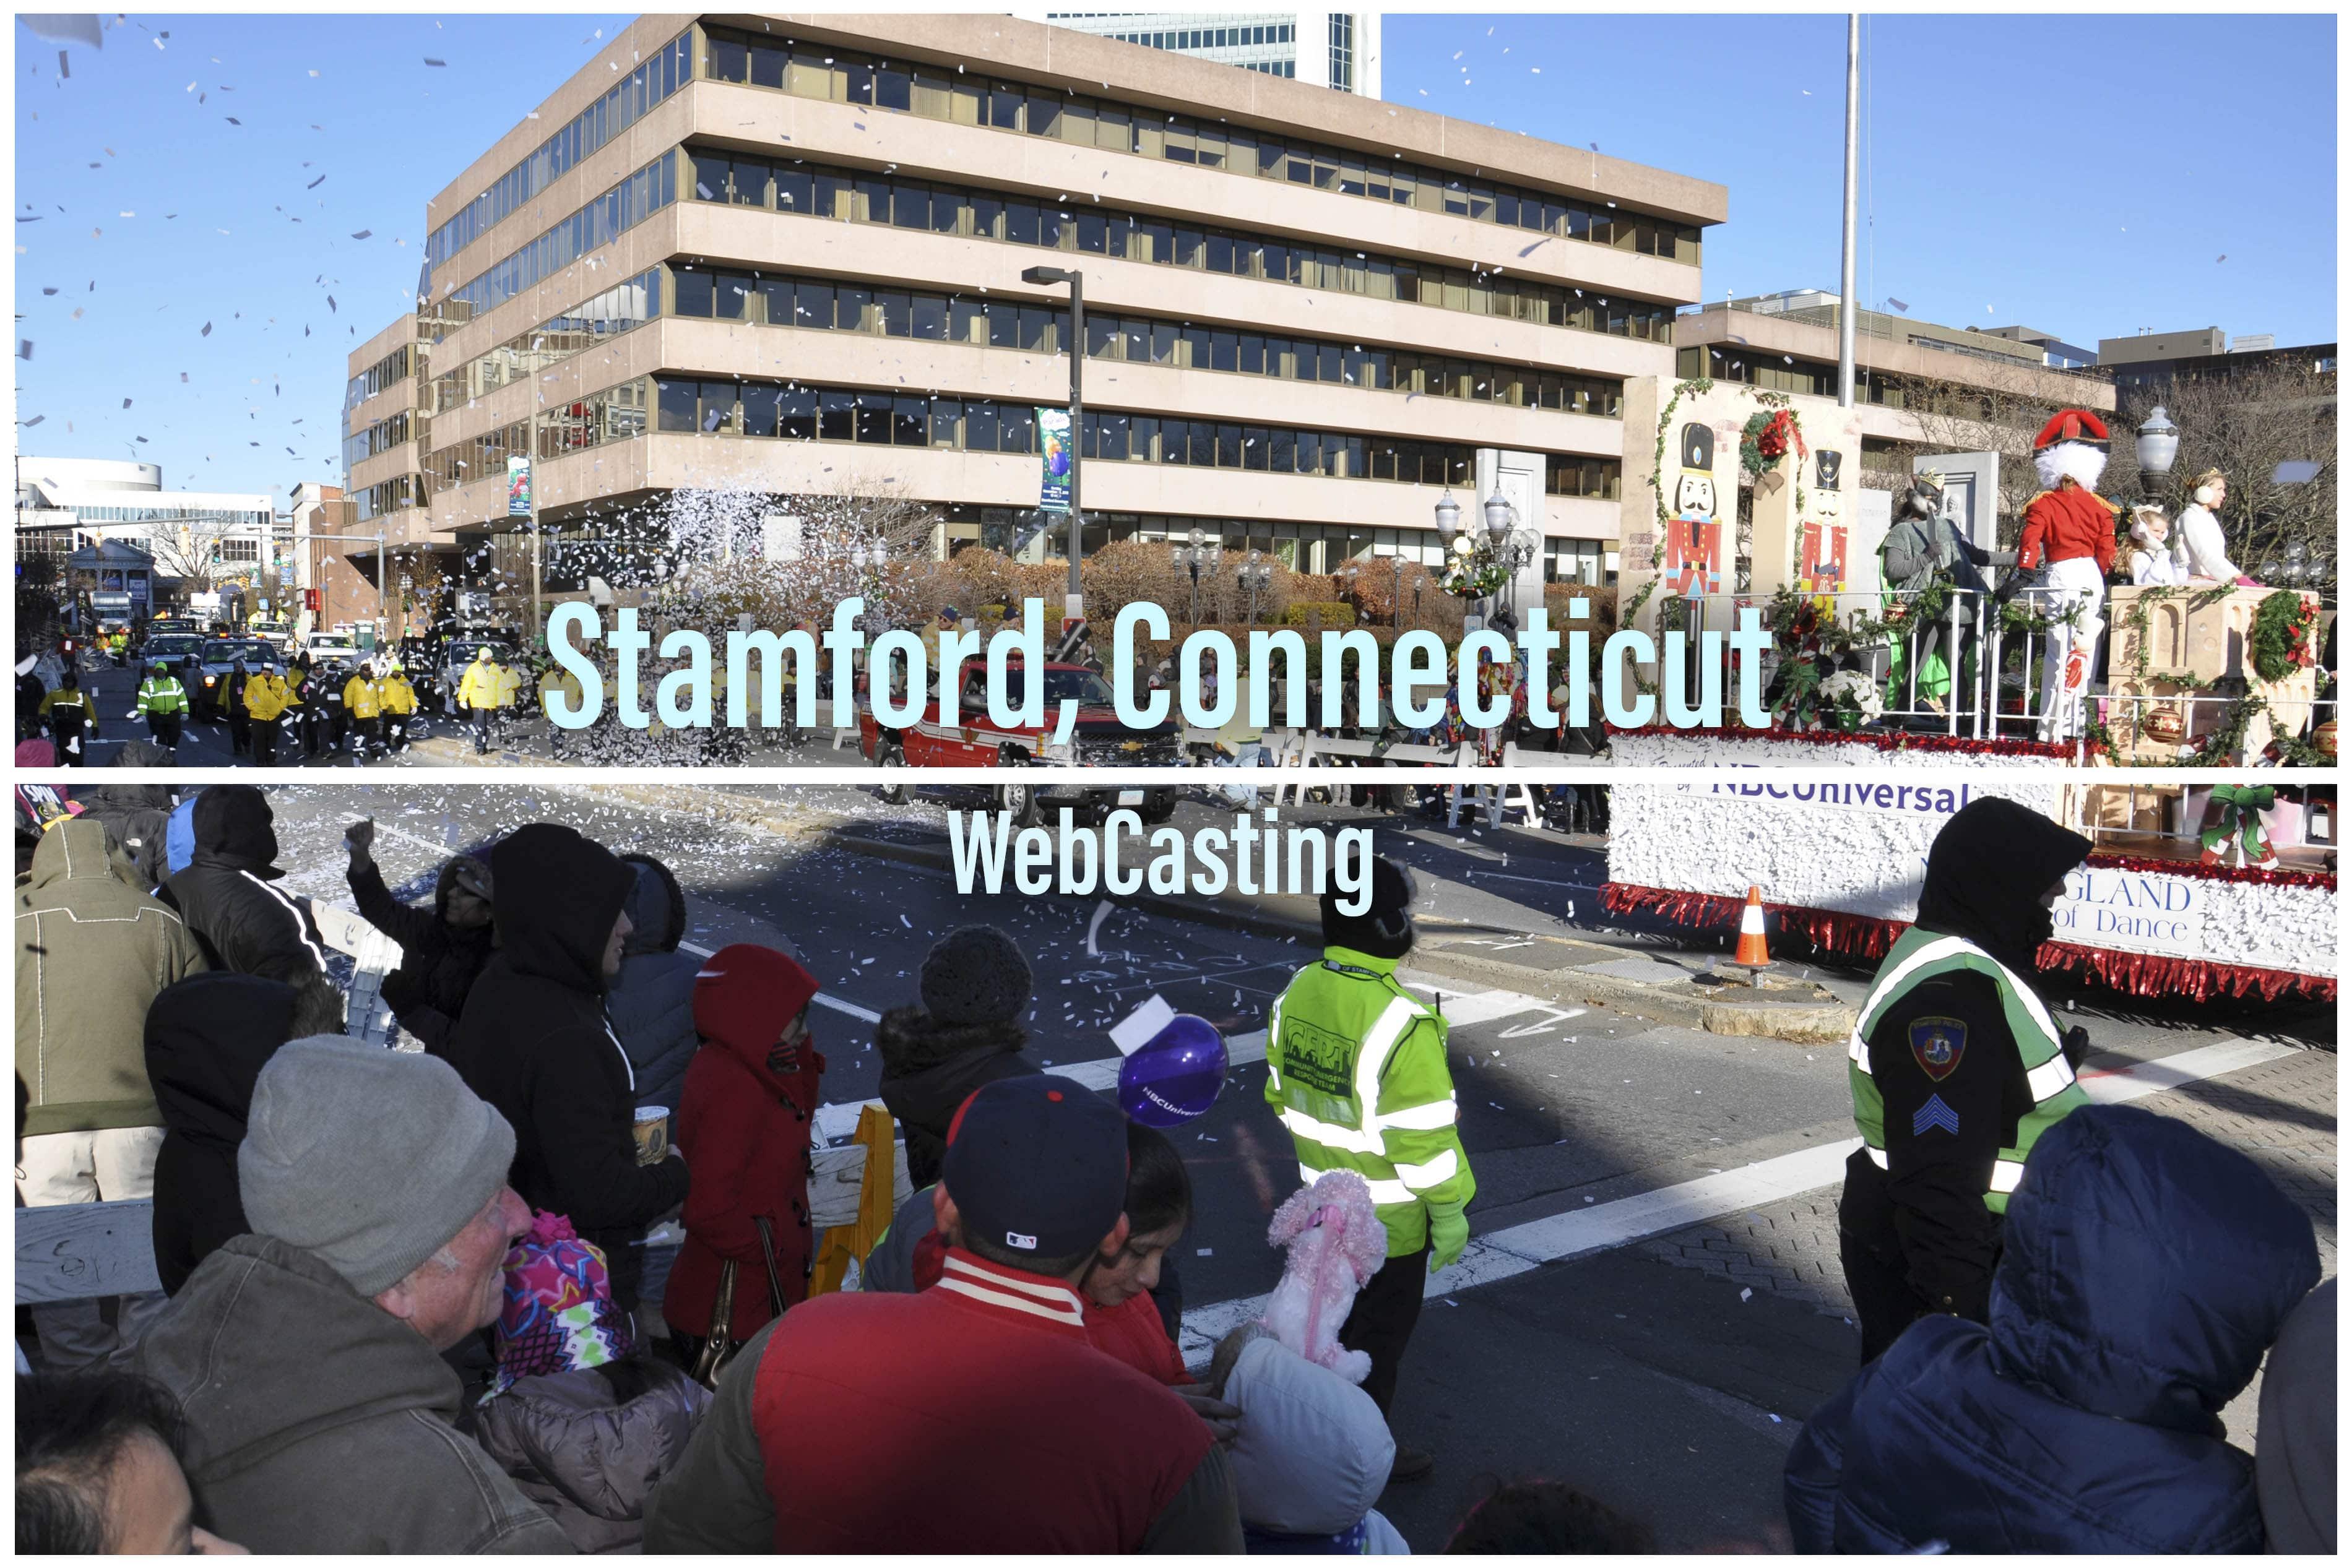 Stamford CT WebCasting